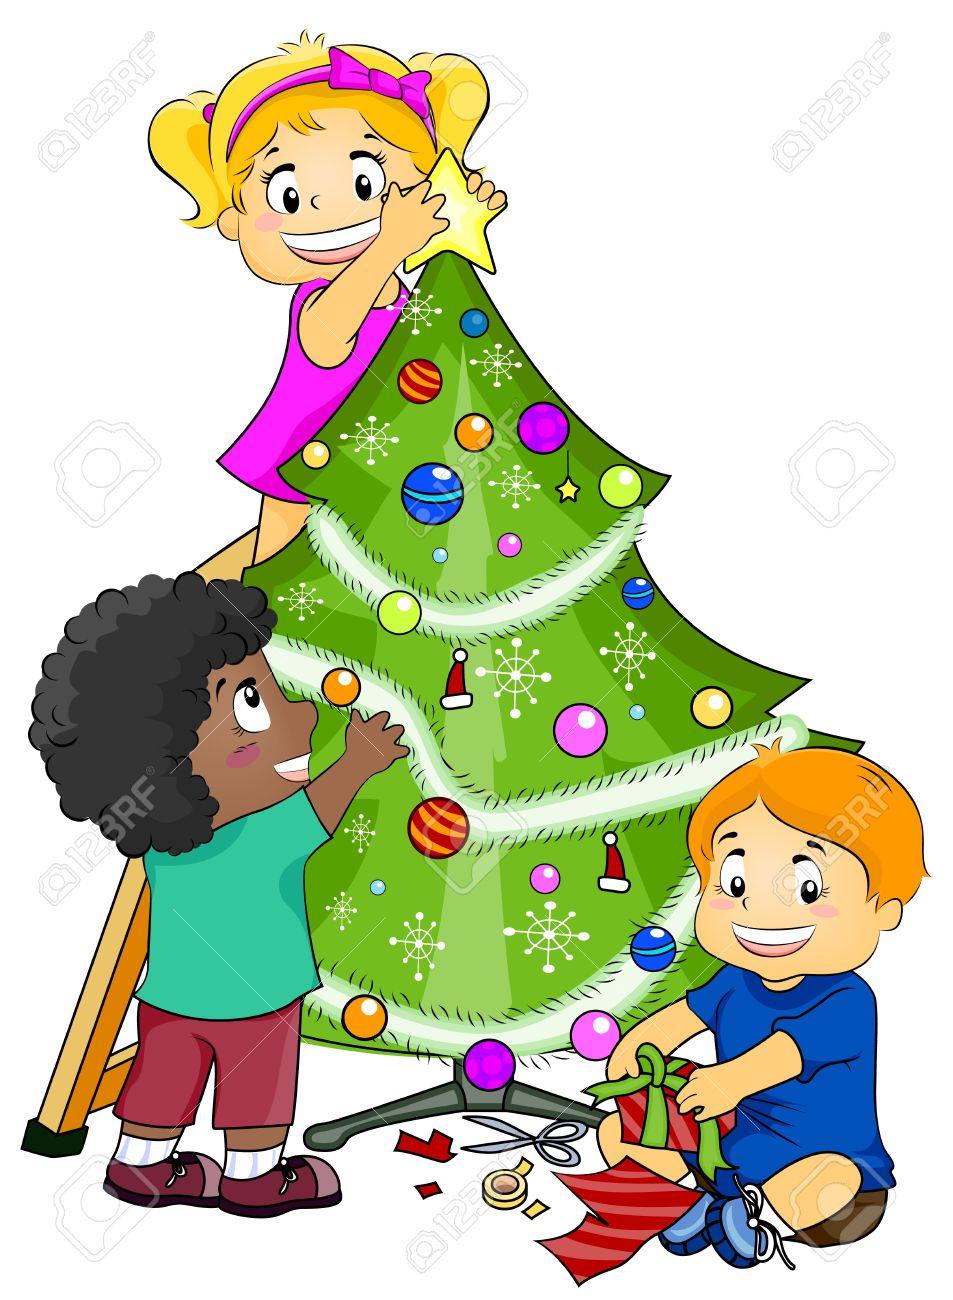 Kids Decorating For Christmas illustration featuring kids decorating a christmas tree stock